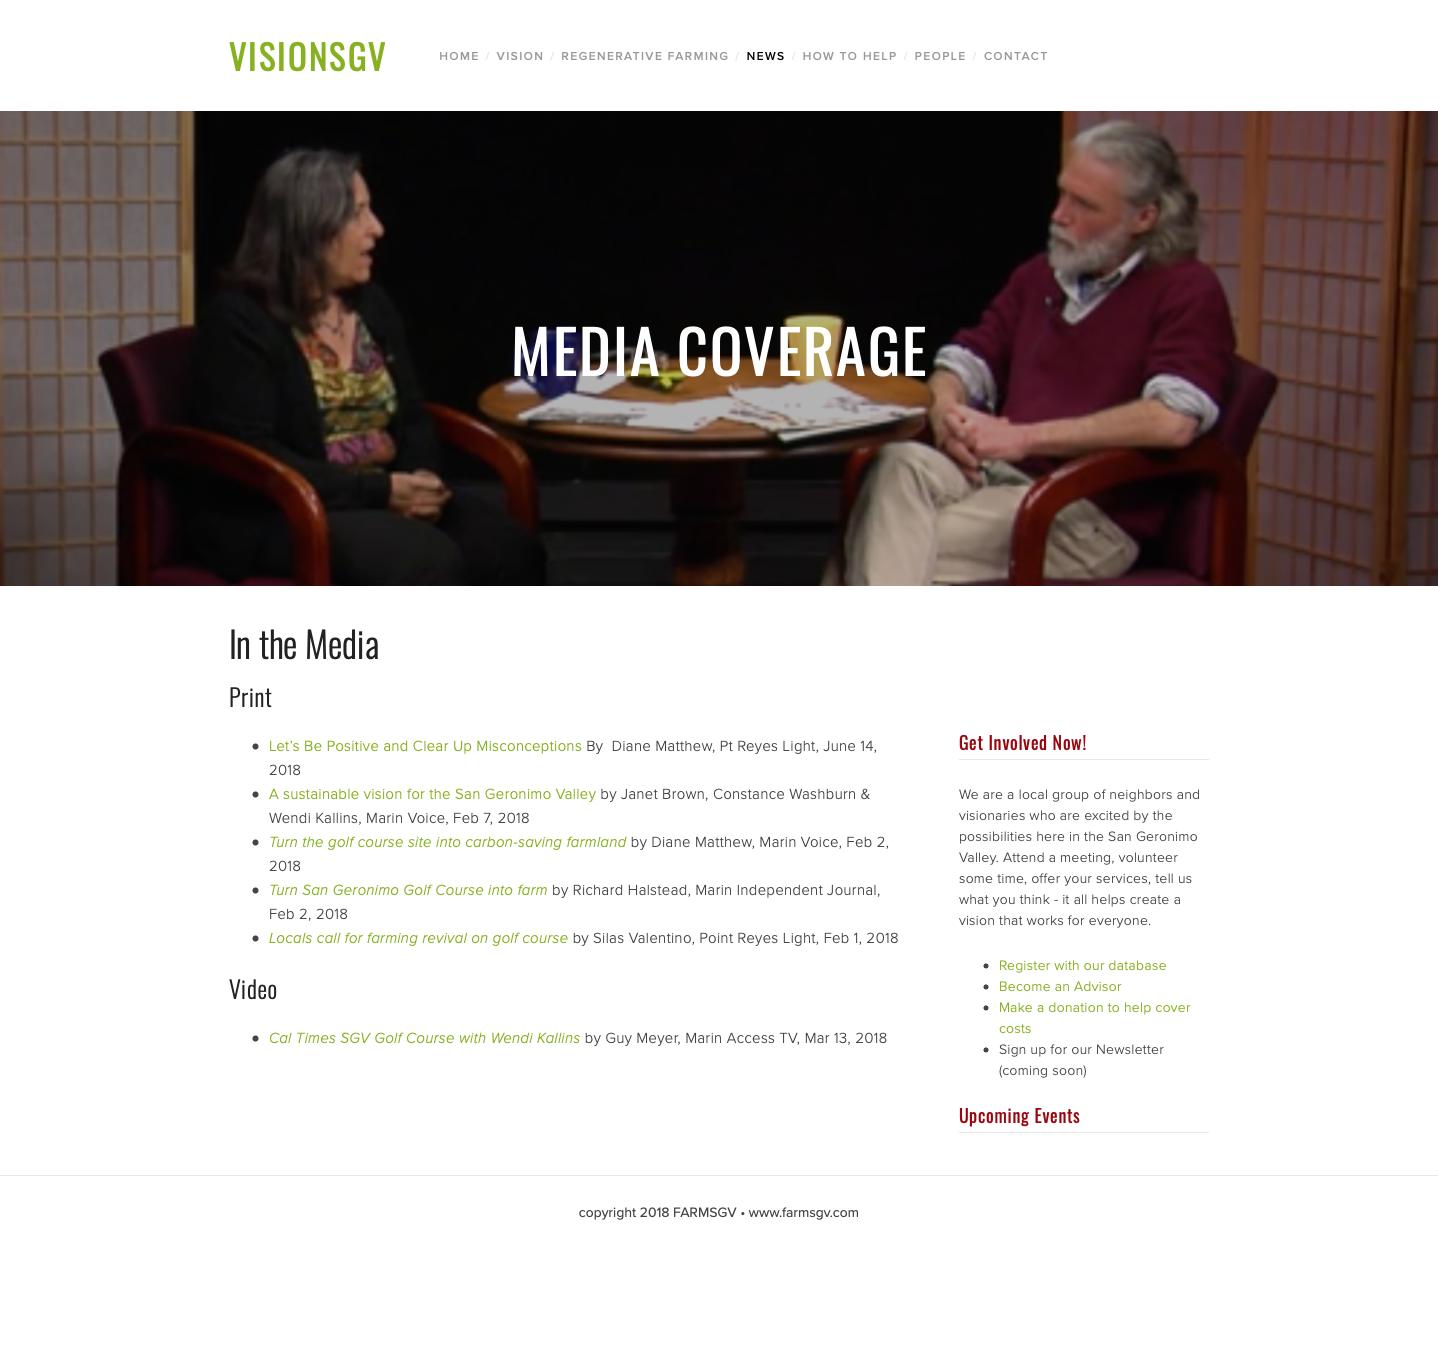 Media Coverage — VisionSGV.png